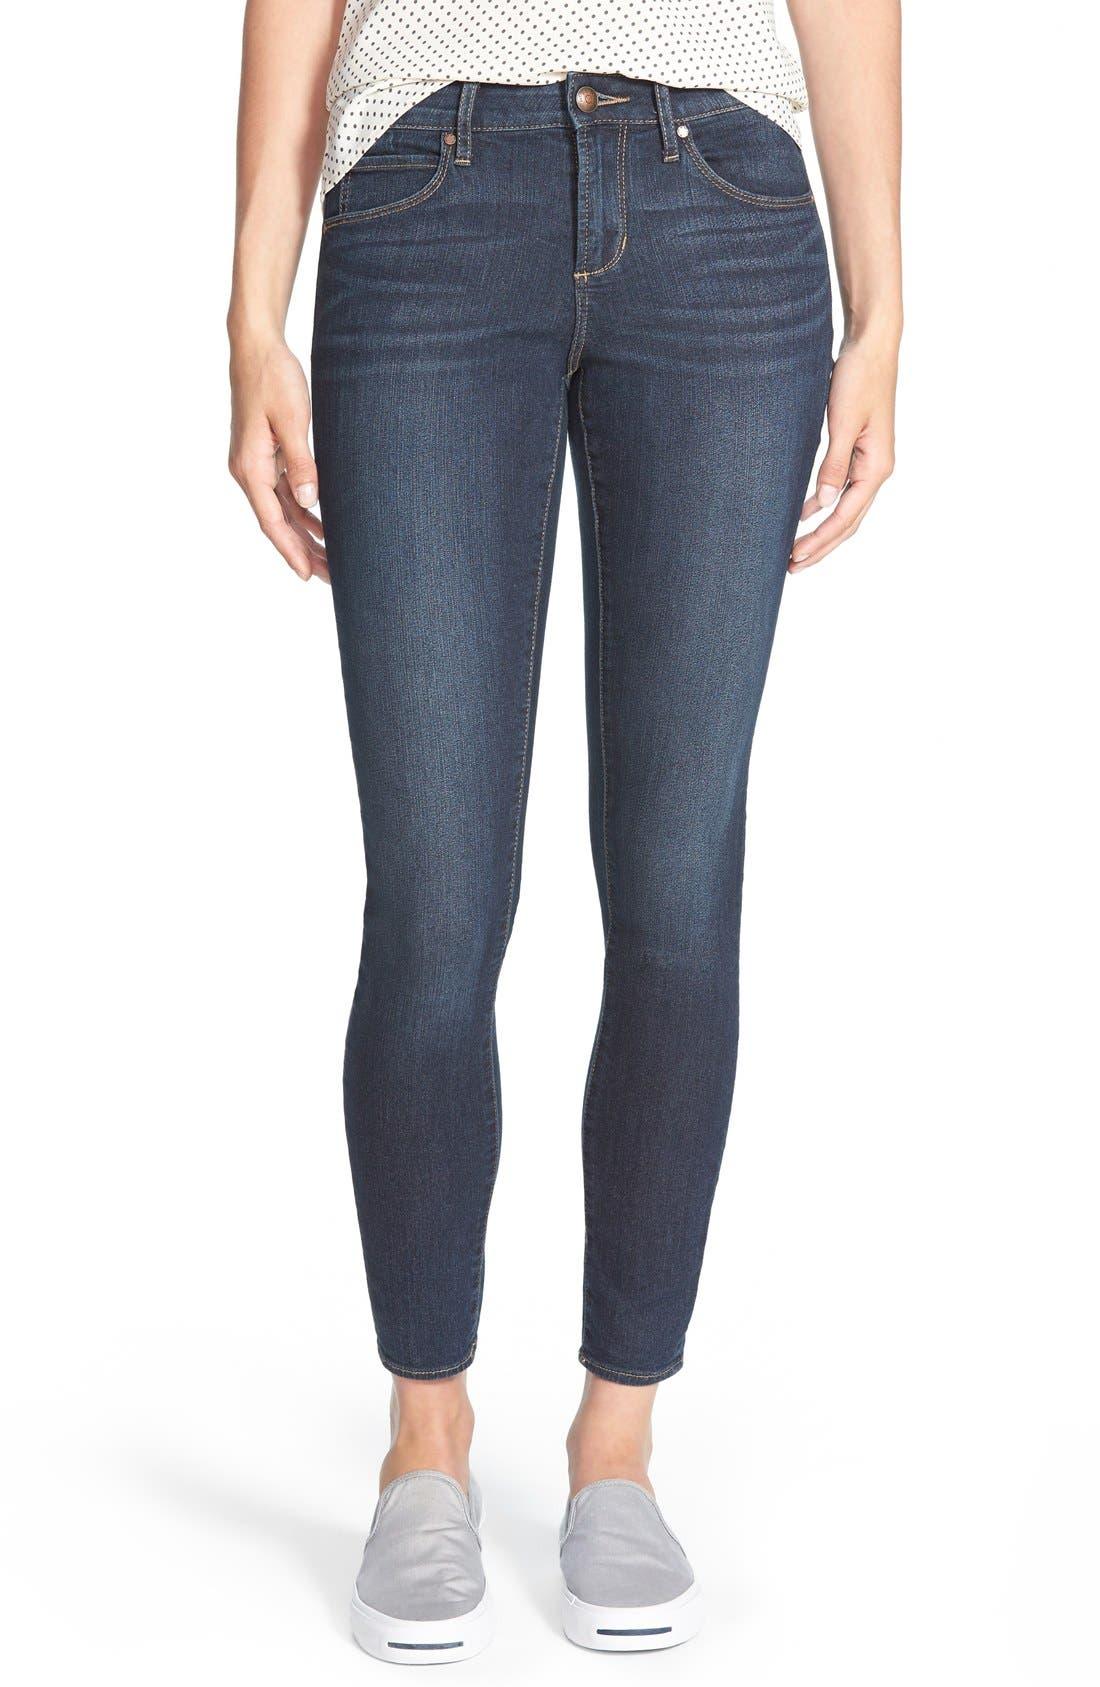 Main Image - Articles of Society 'Sarah' Skinny Jeans (Blue Moon)